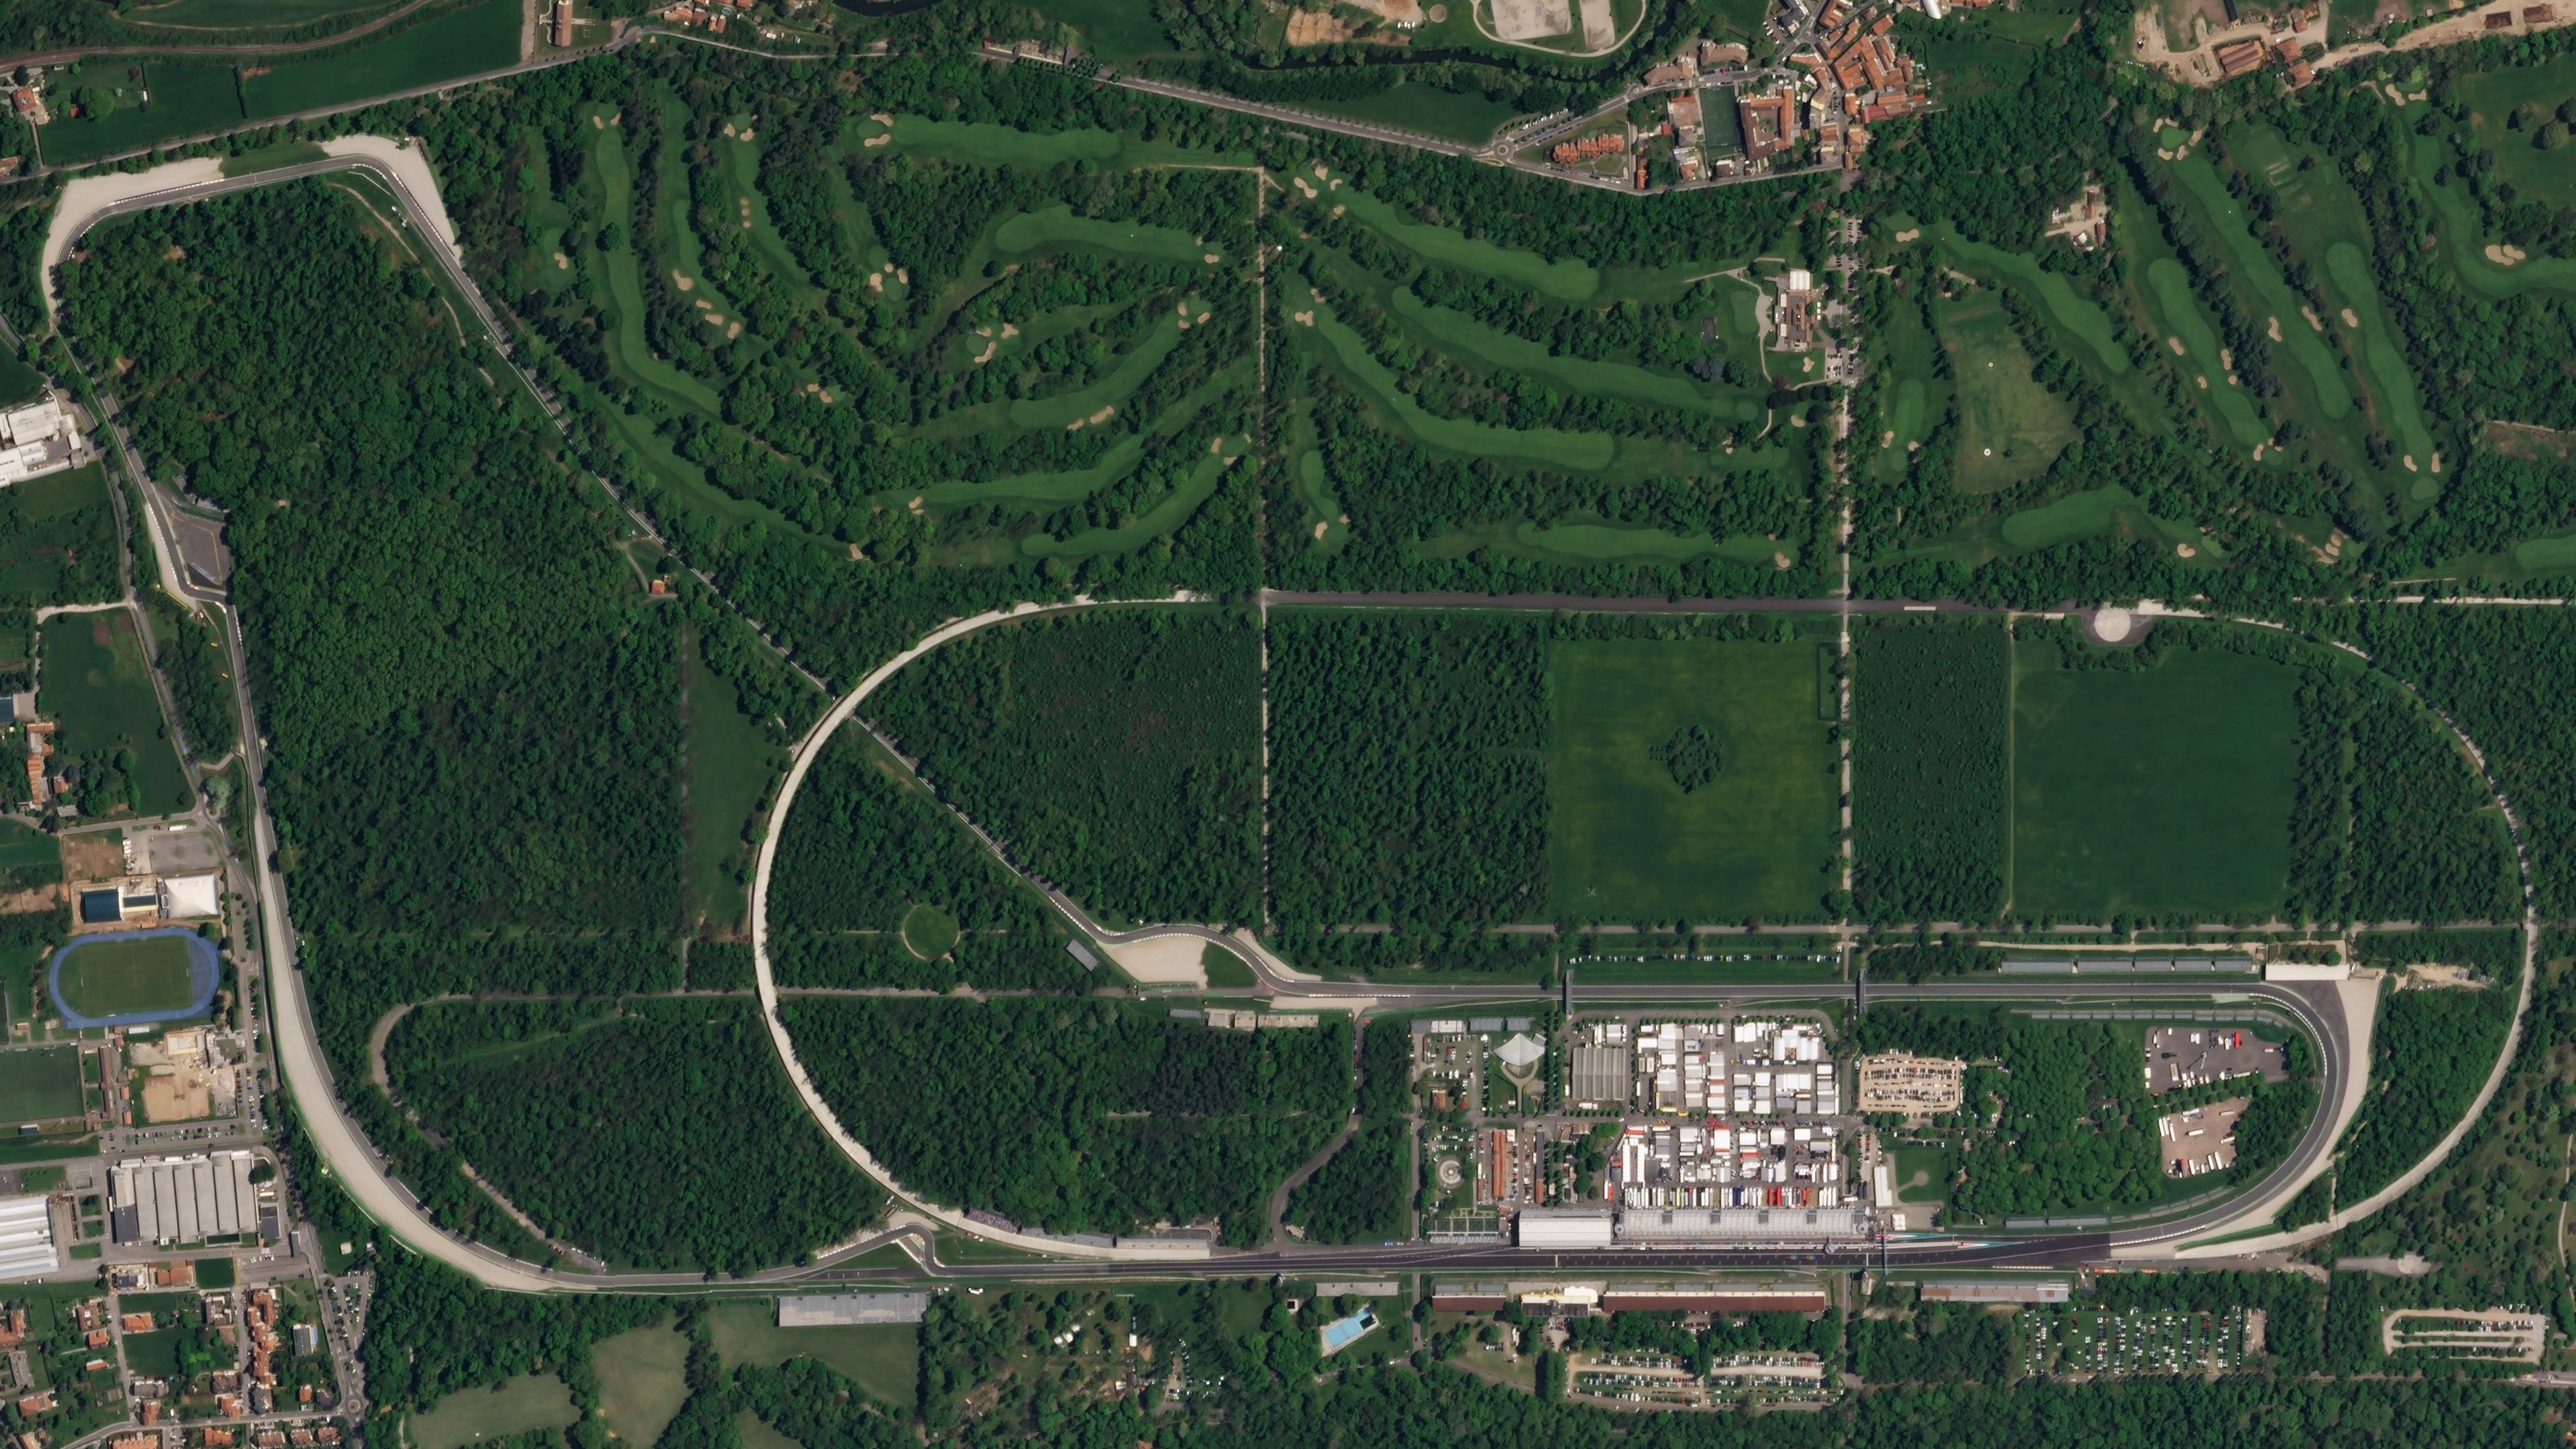 https://upload.wikimedia.org/wikipedia/commons/6/6f/Autodromo_Nazionale_Monza%2C_April_22%2C_2018_SkySat_%28cropped%29.jpg